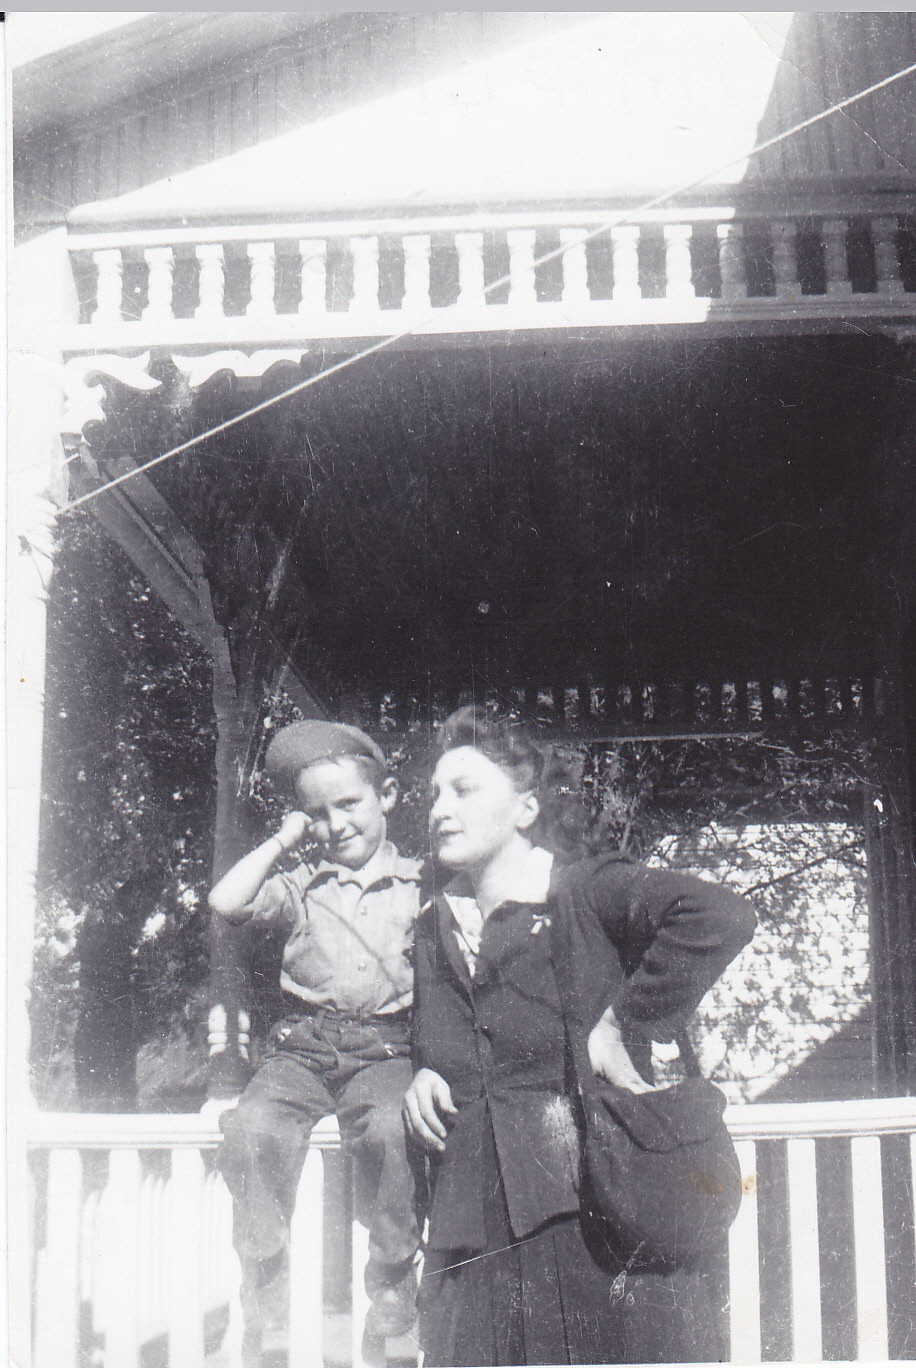 mom & bro 1943